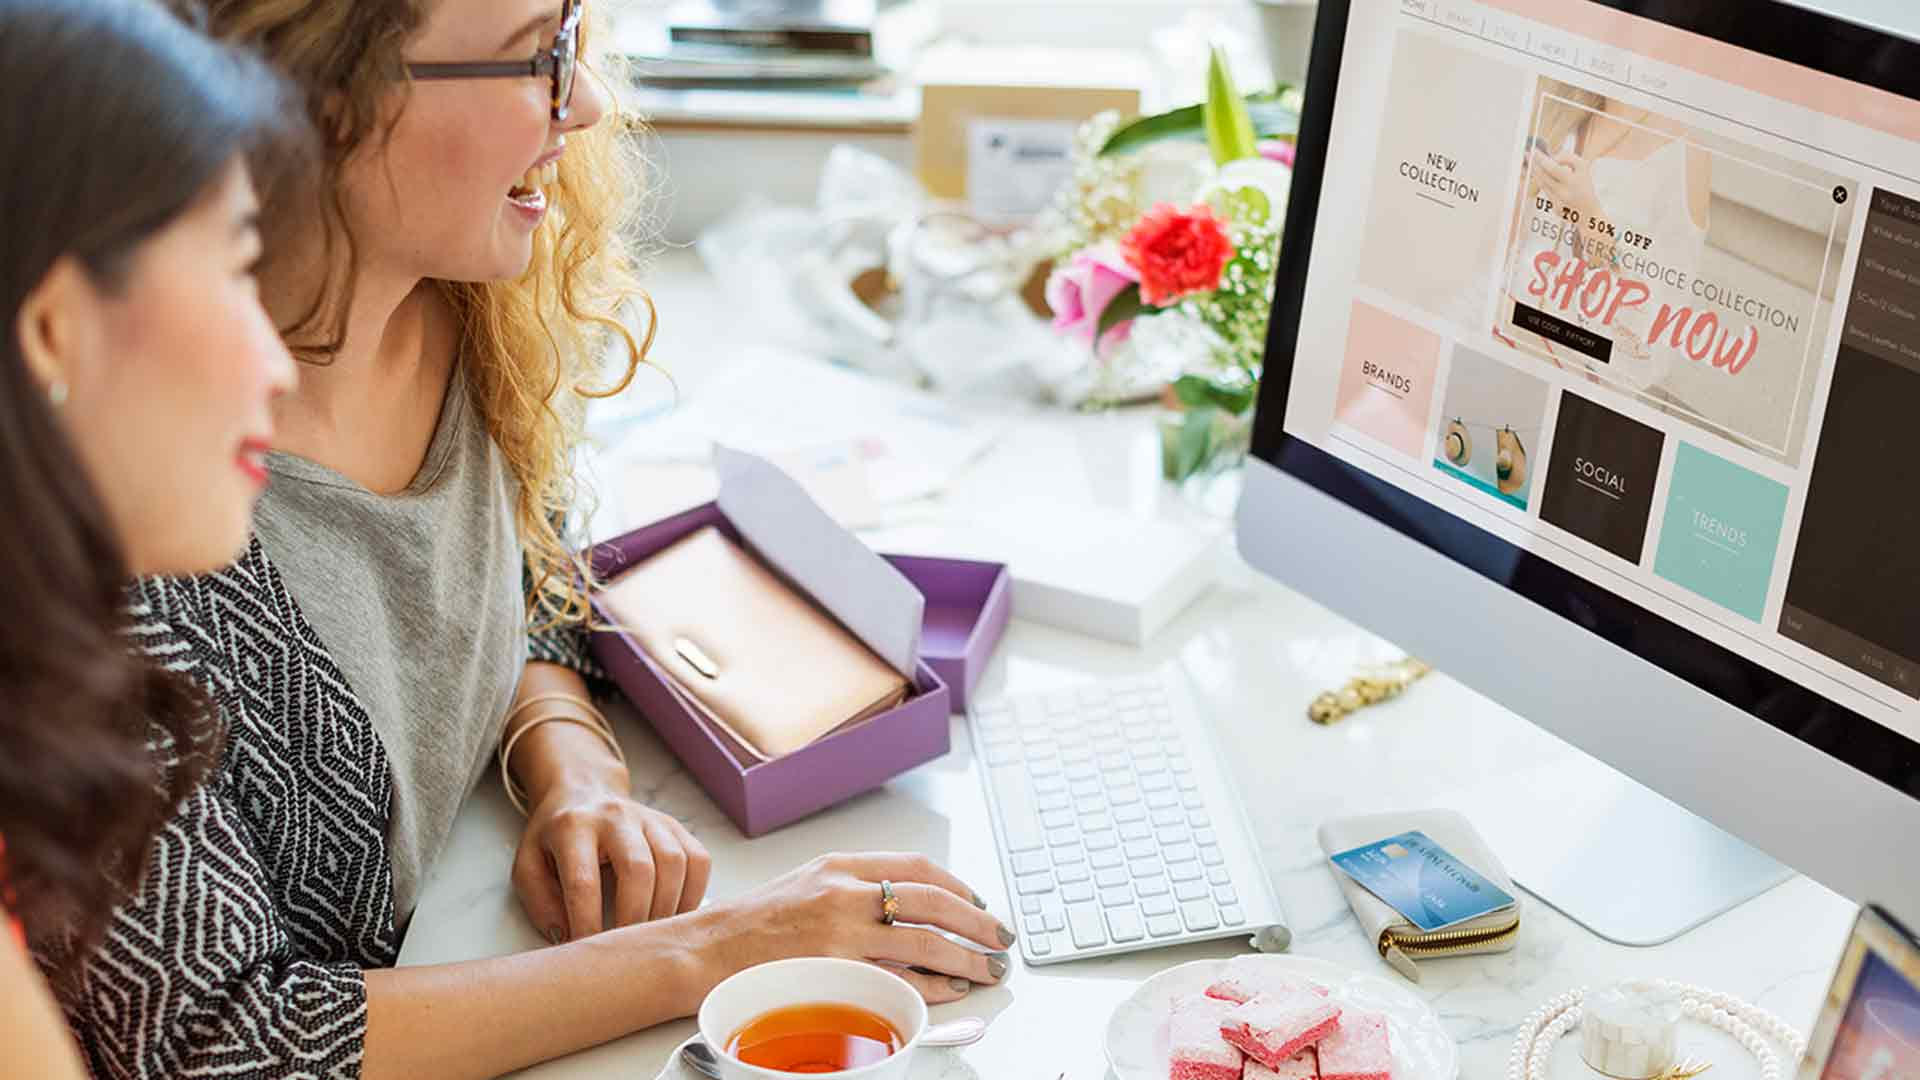 Online Shopping per PC